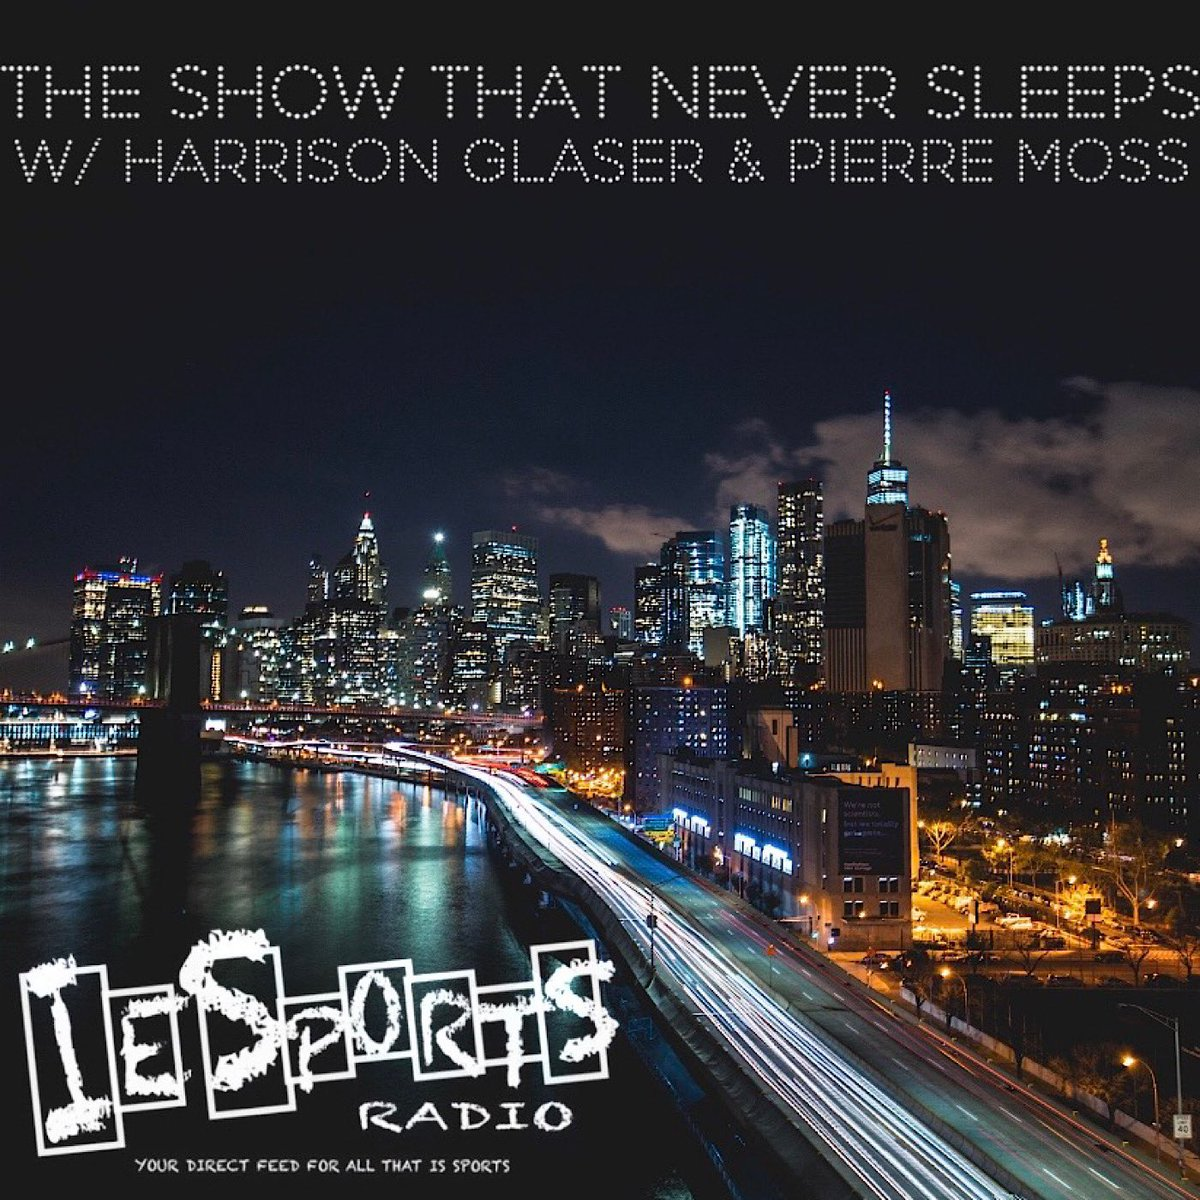 Next Up: WED 1/20 6pm EST #TheShowThatNeverSleeps with @NYJetsTFMedia & @skywalker42811 #NFL#TakeFlight#TogetherBlue#NBA #NewYorkForever#BrooklynTogether#MLB #NYYForNY #LGM @ShowNvrSleepsIE